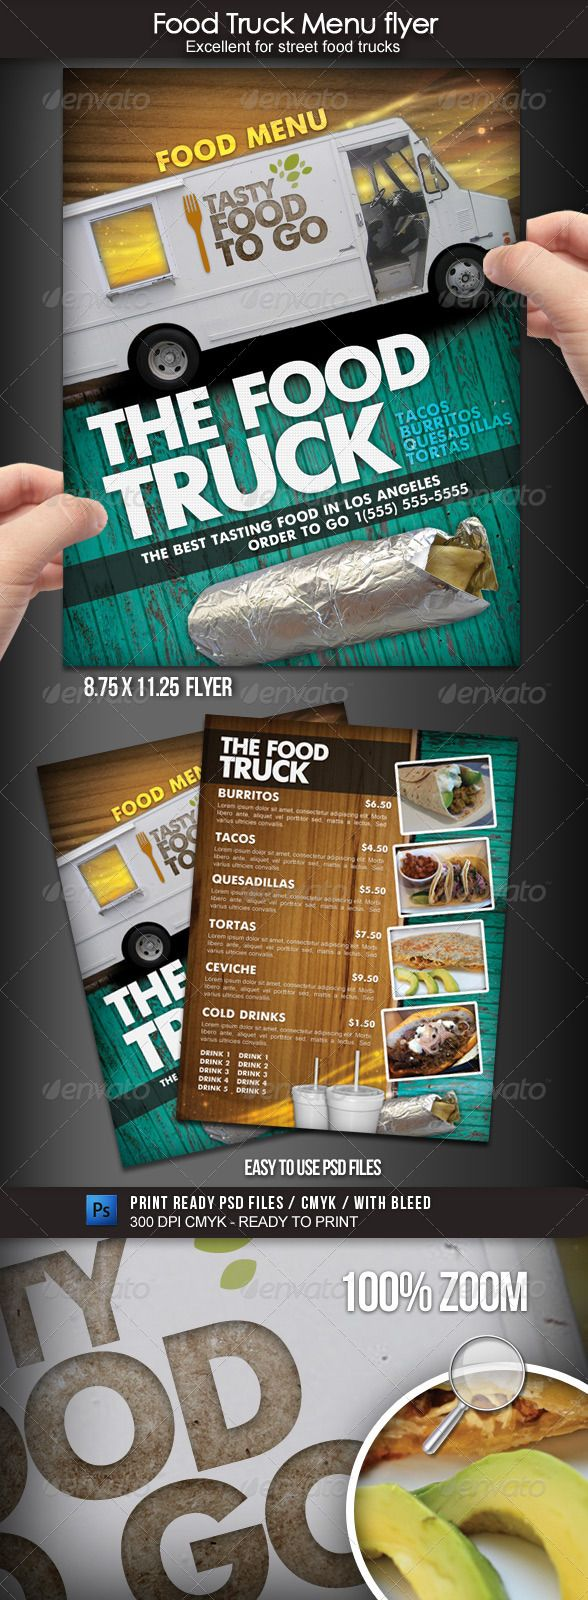 food truck menu flyer food menus print templates print design